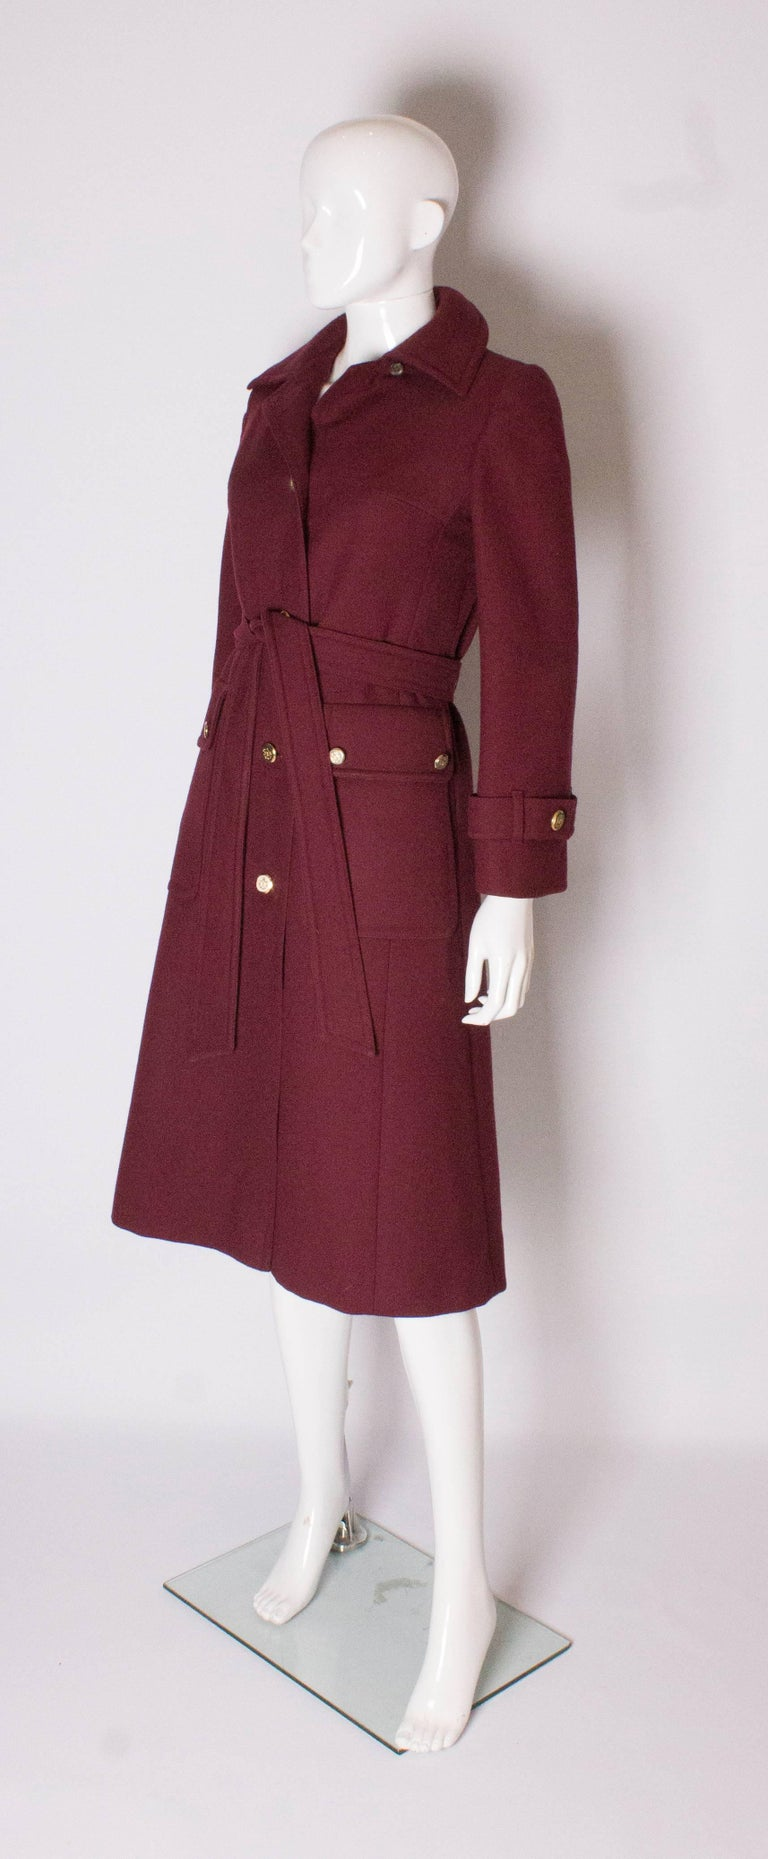 Brown Burgundy Wool Coat by Aquascutum For Sale